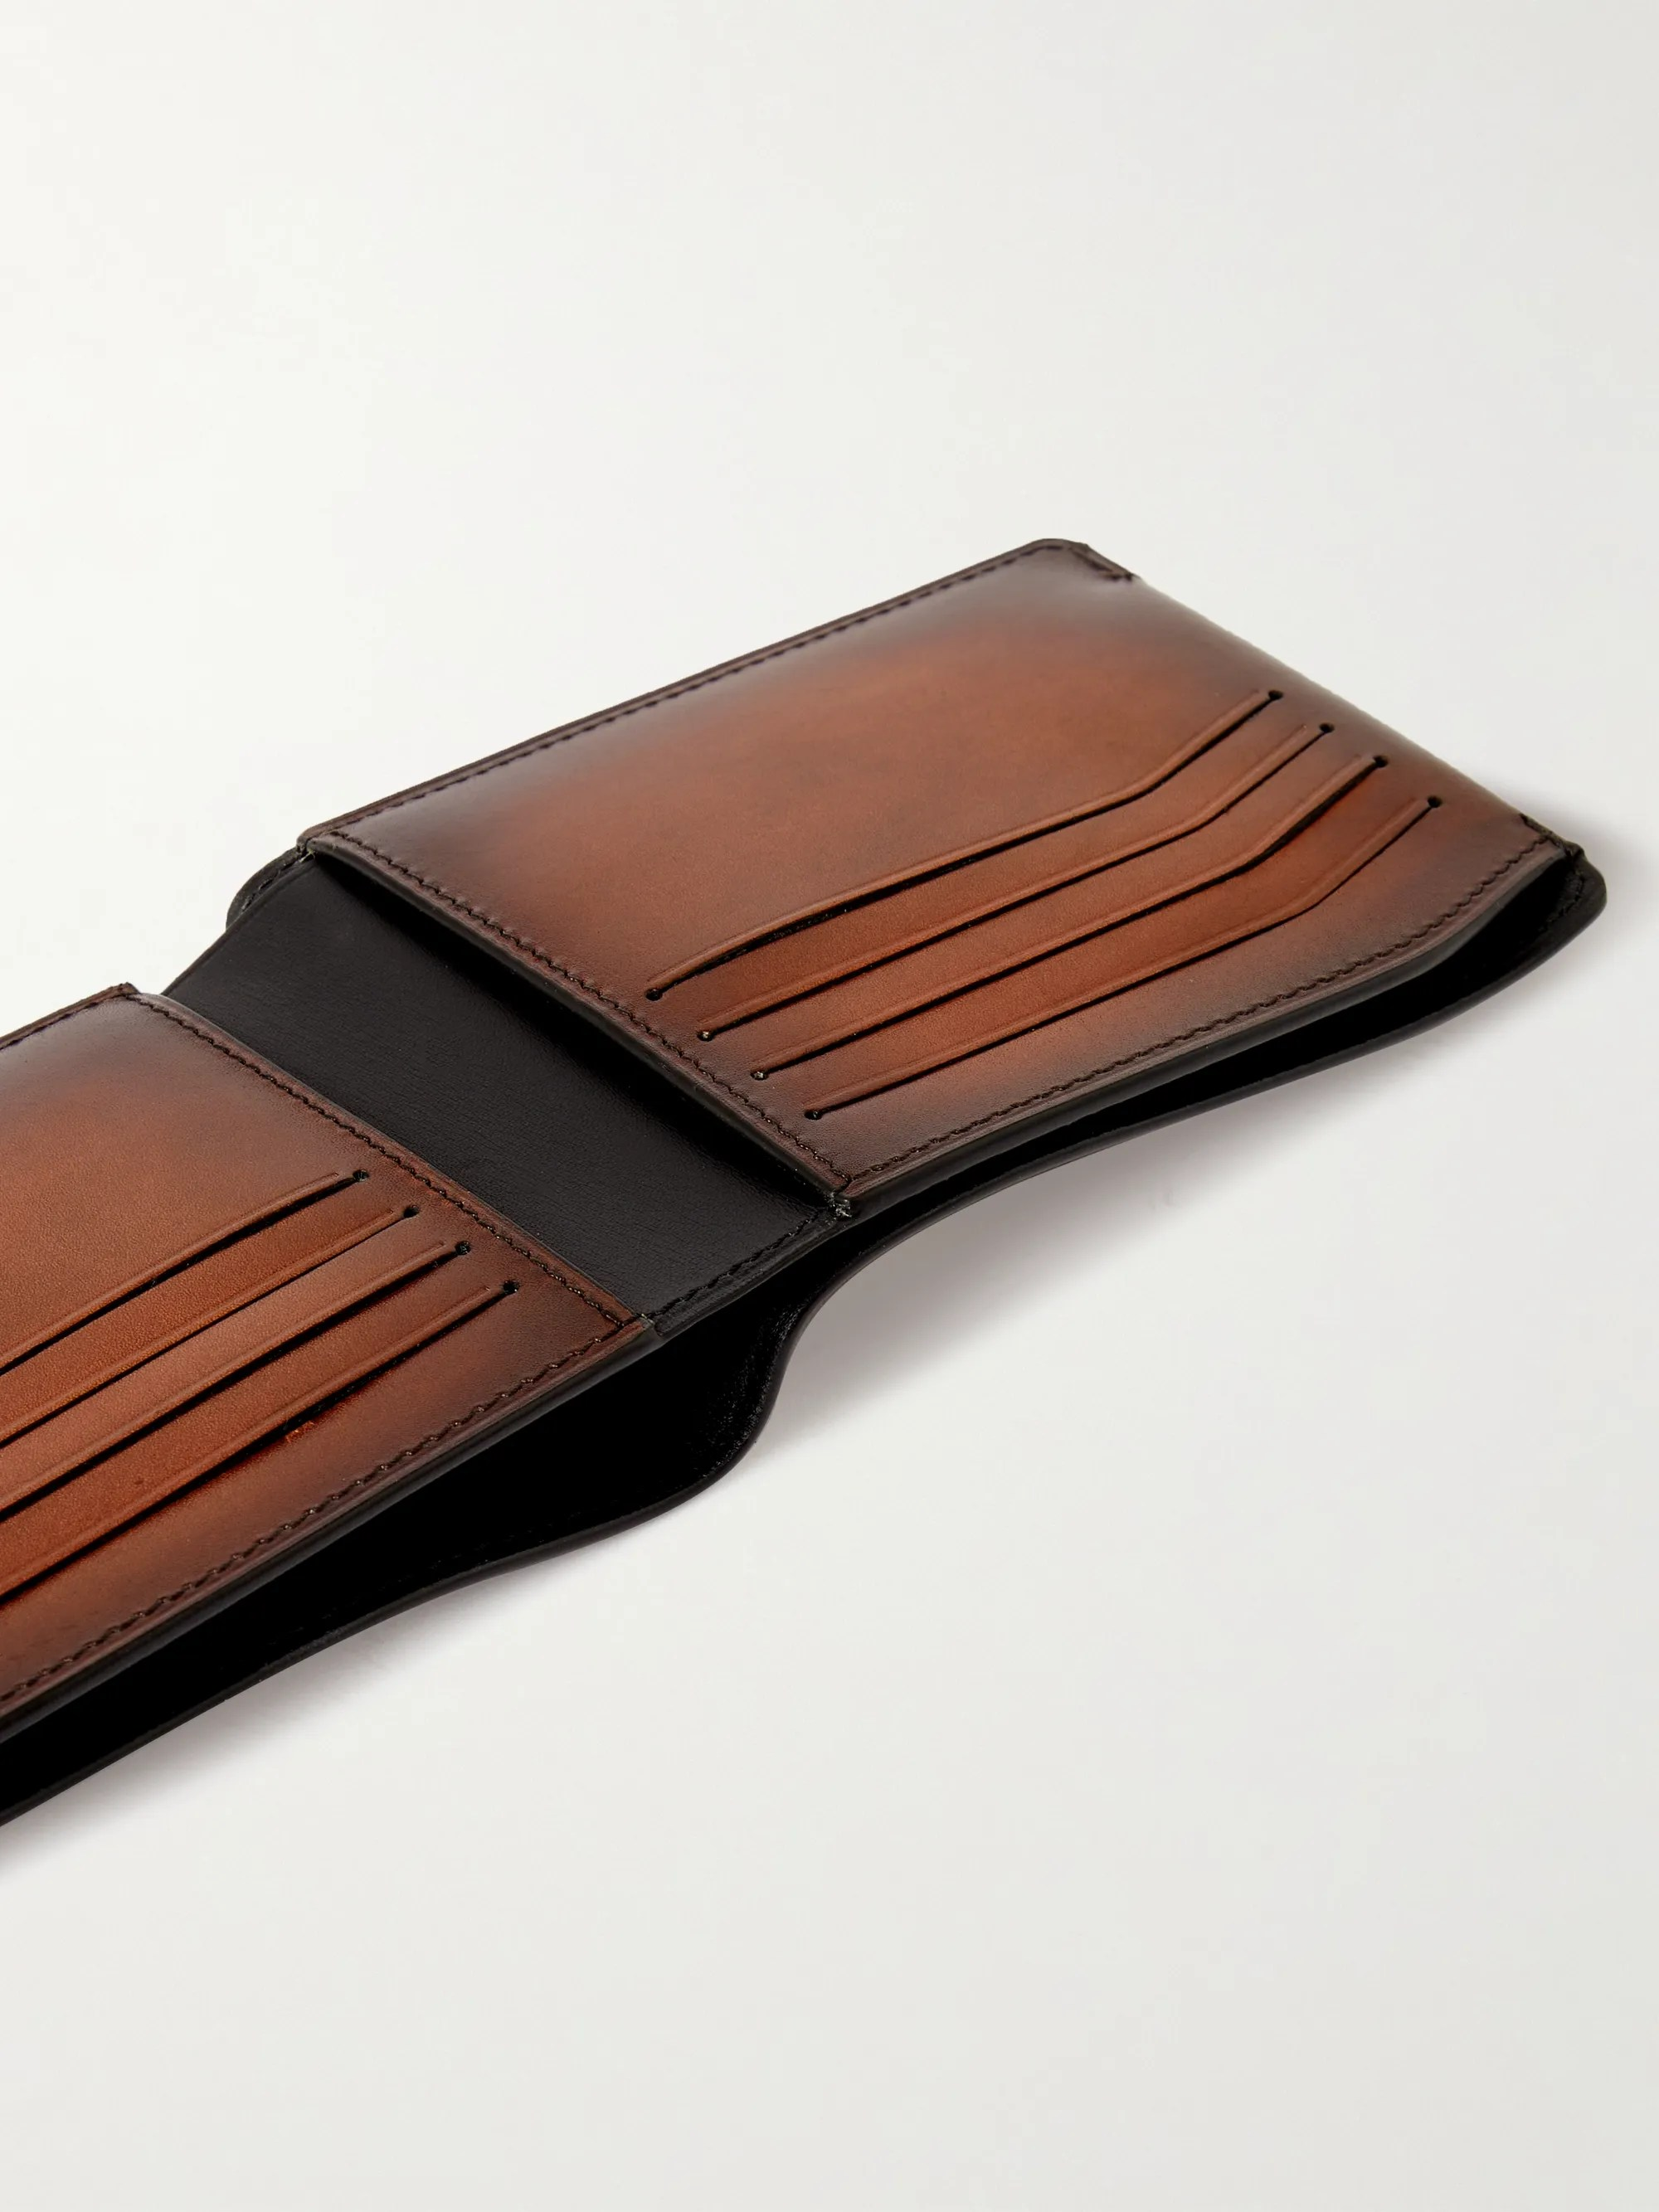 Brown Leather Billfold Wallet | Berluti | MR PORTER